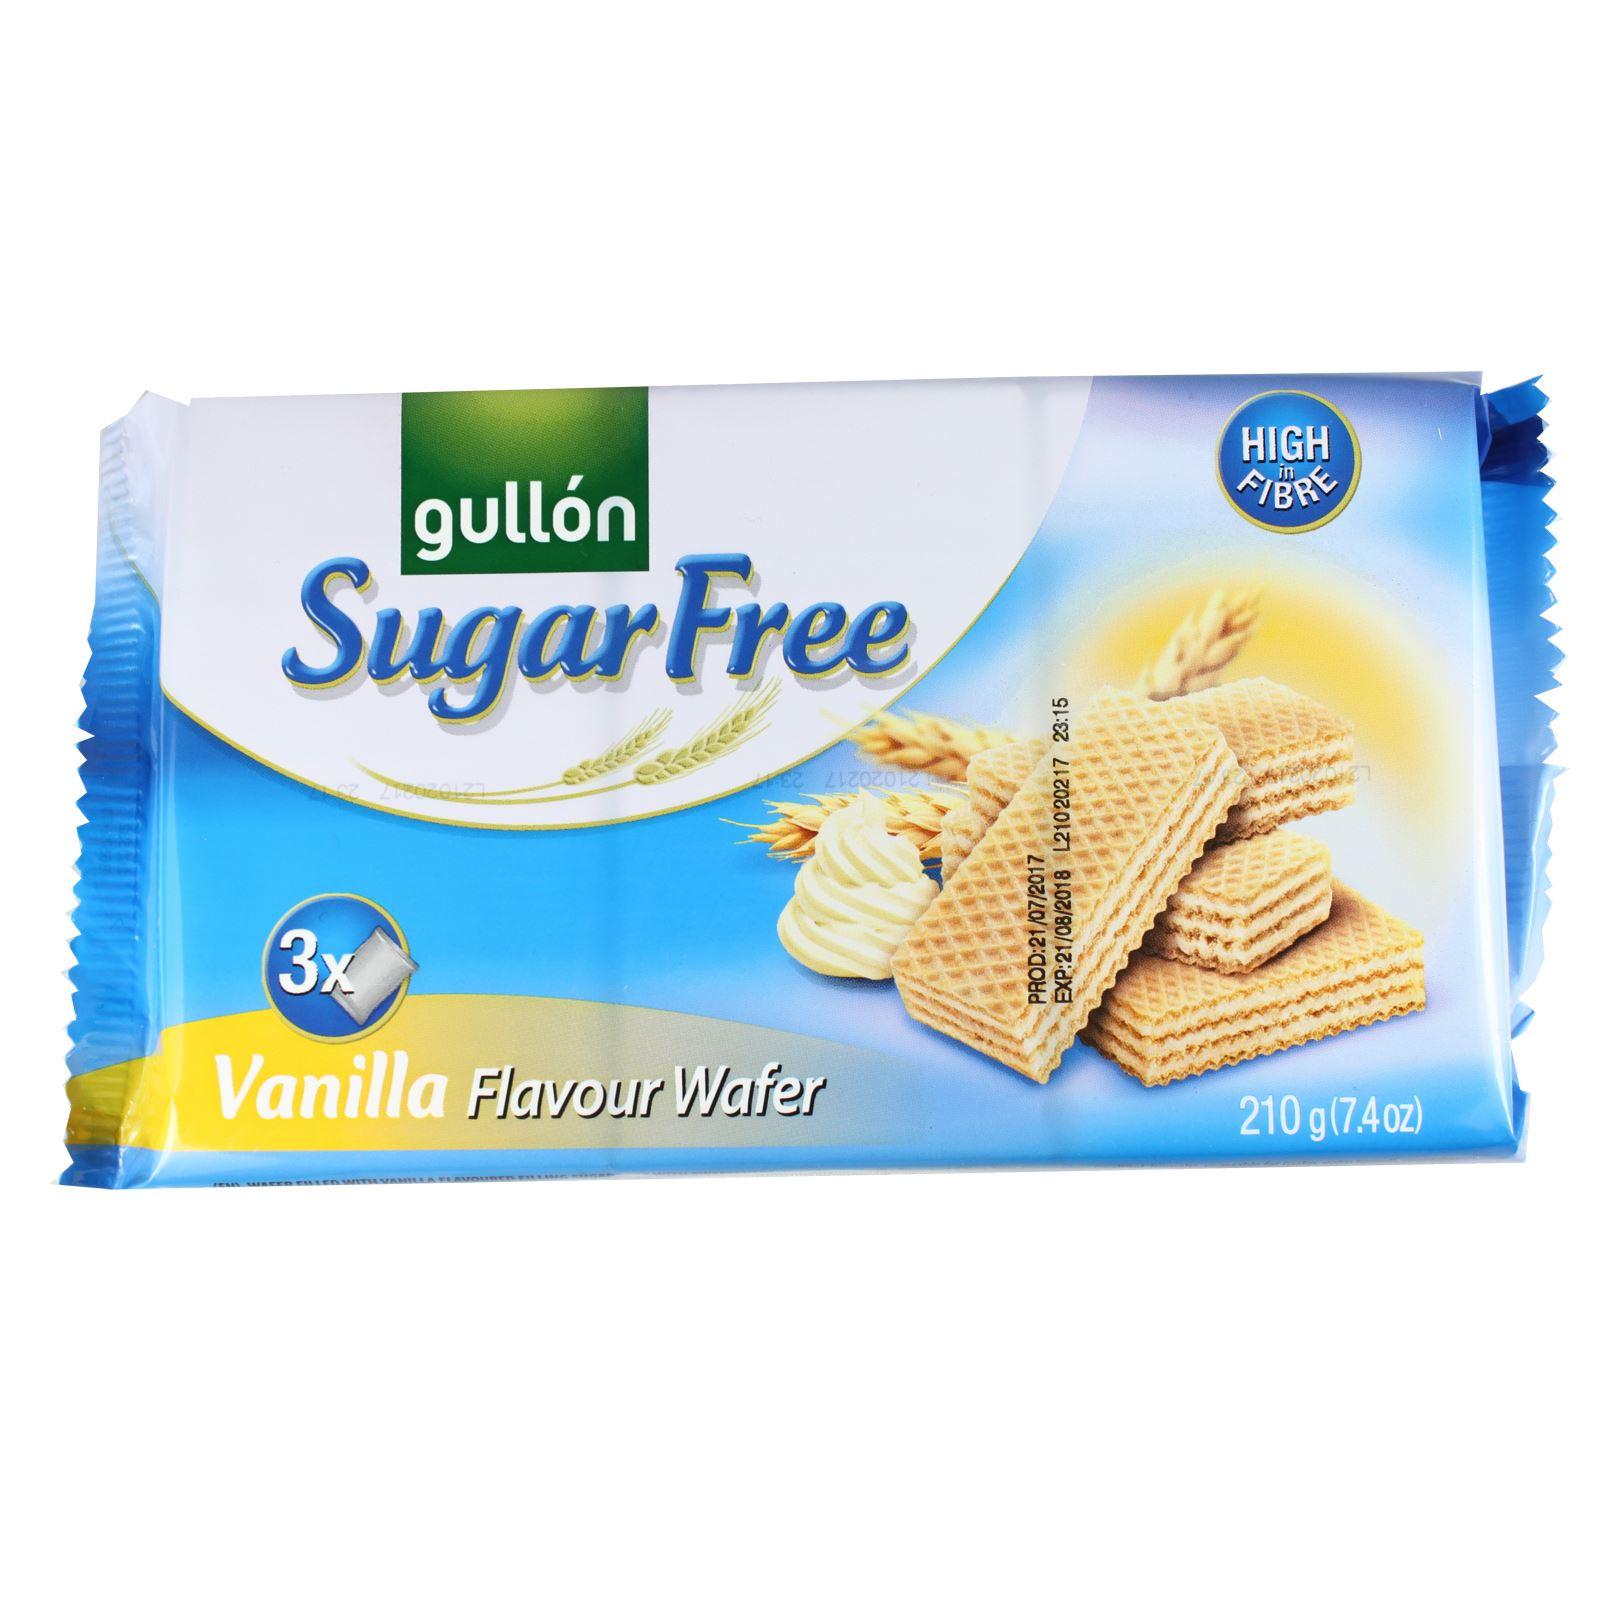 Gullon-Sugar-Free-No-Added-Sugar-Diabetic-Diet-Fibre-Biscuits-Chocolate-Wafers